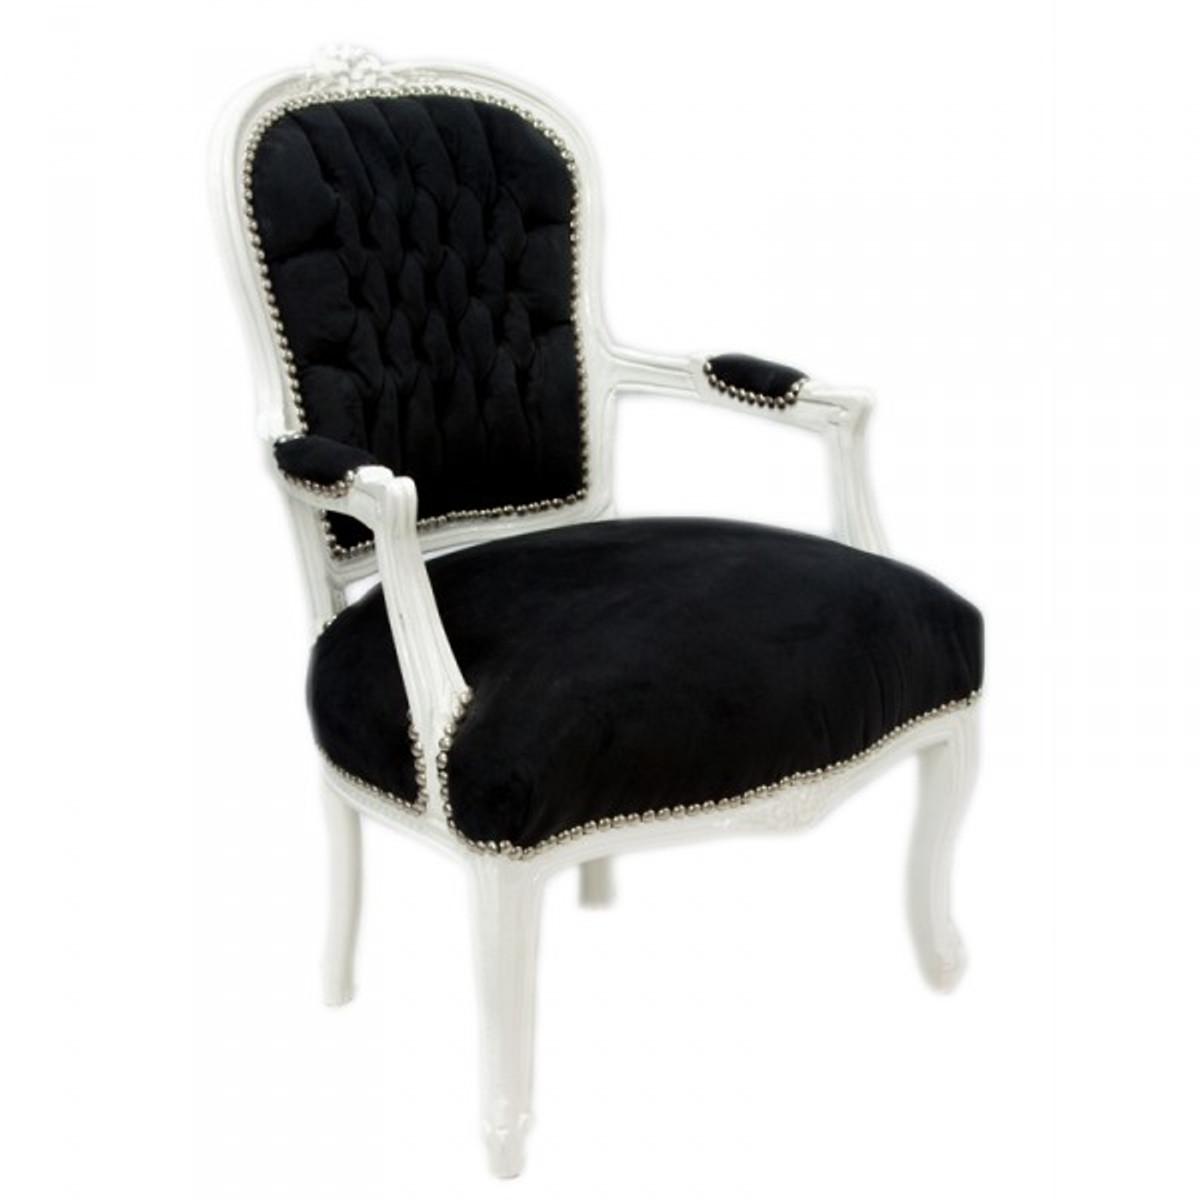 casa padrino barock salon stuhl schwarz weiss st hle barock st hle barock salon st hle mod1. Black Bedroom Furniture Sets. Home Design Ideas